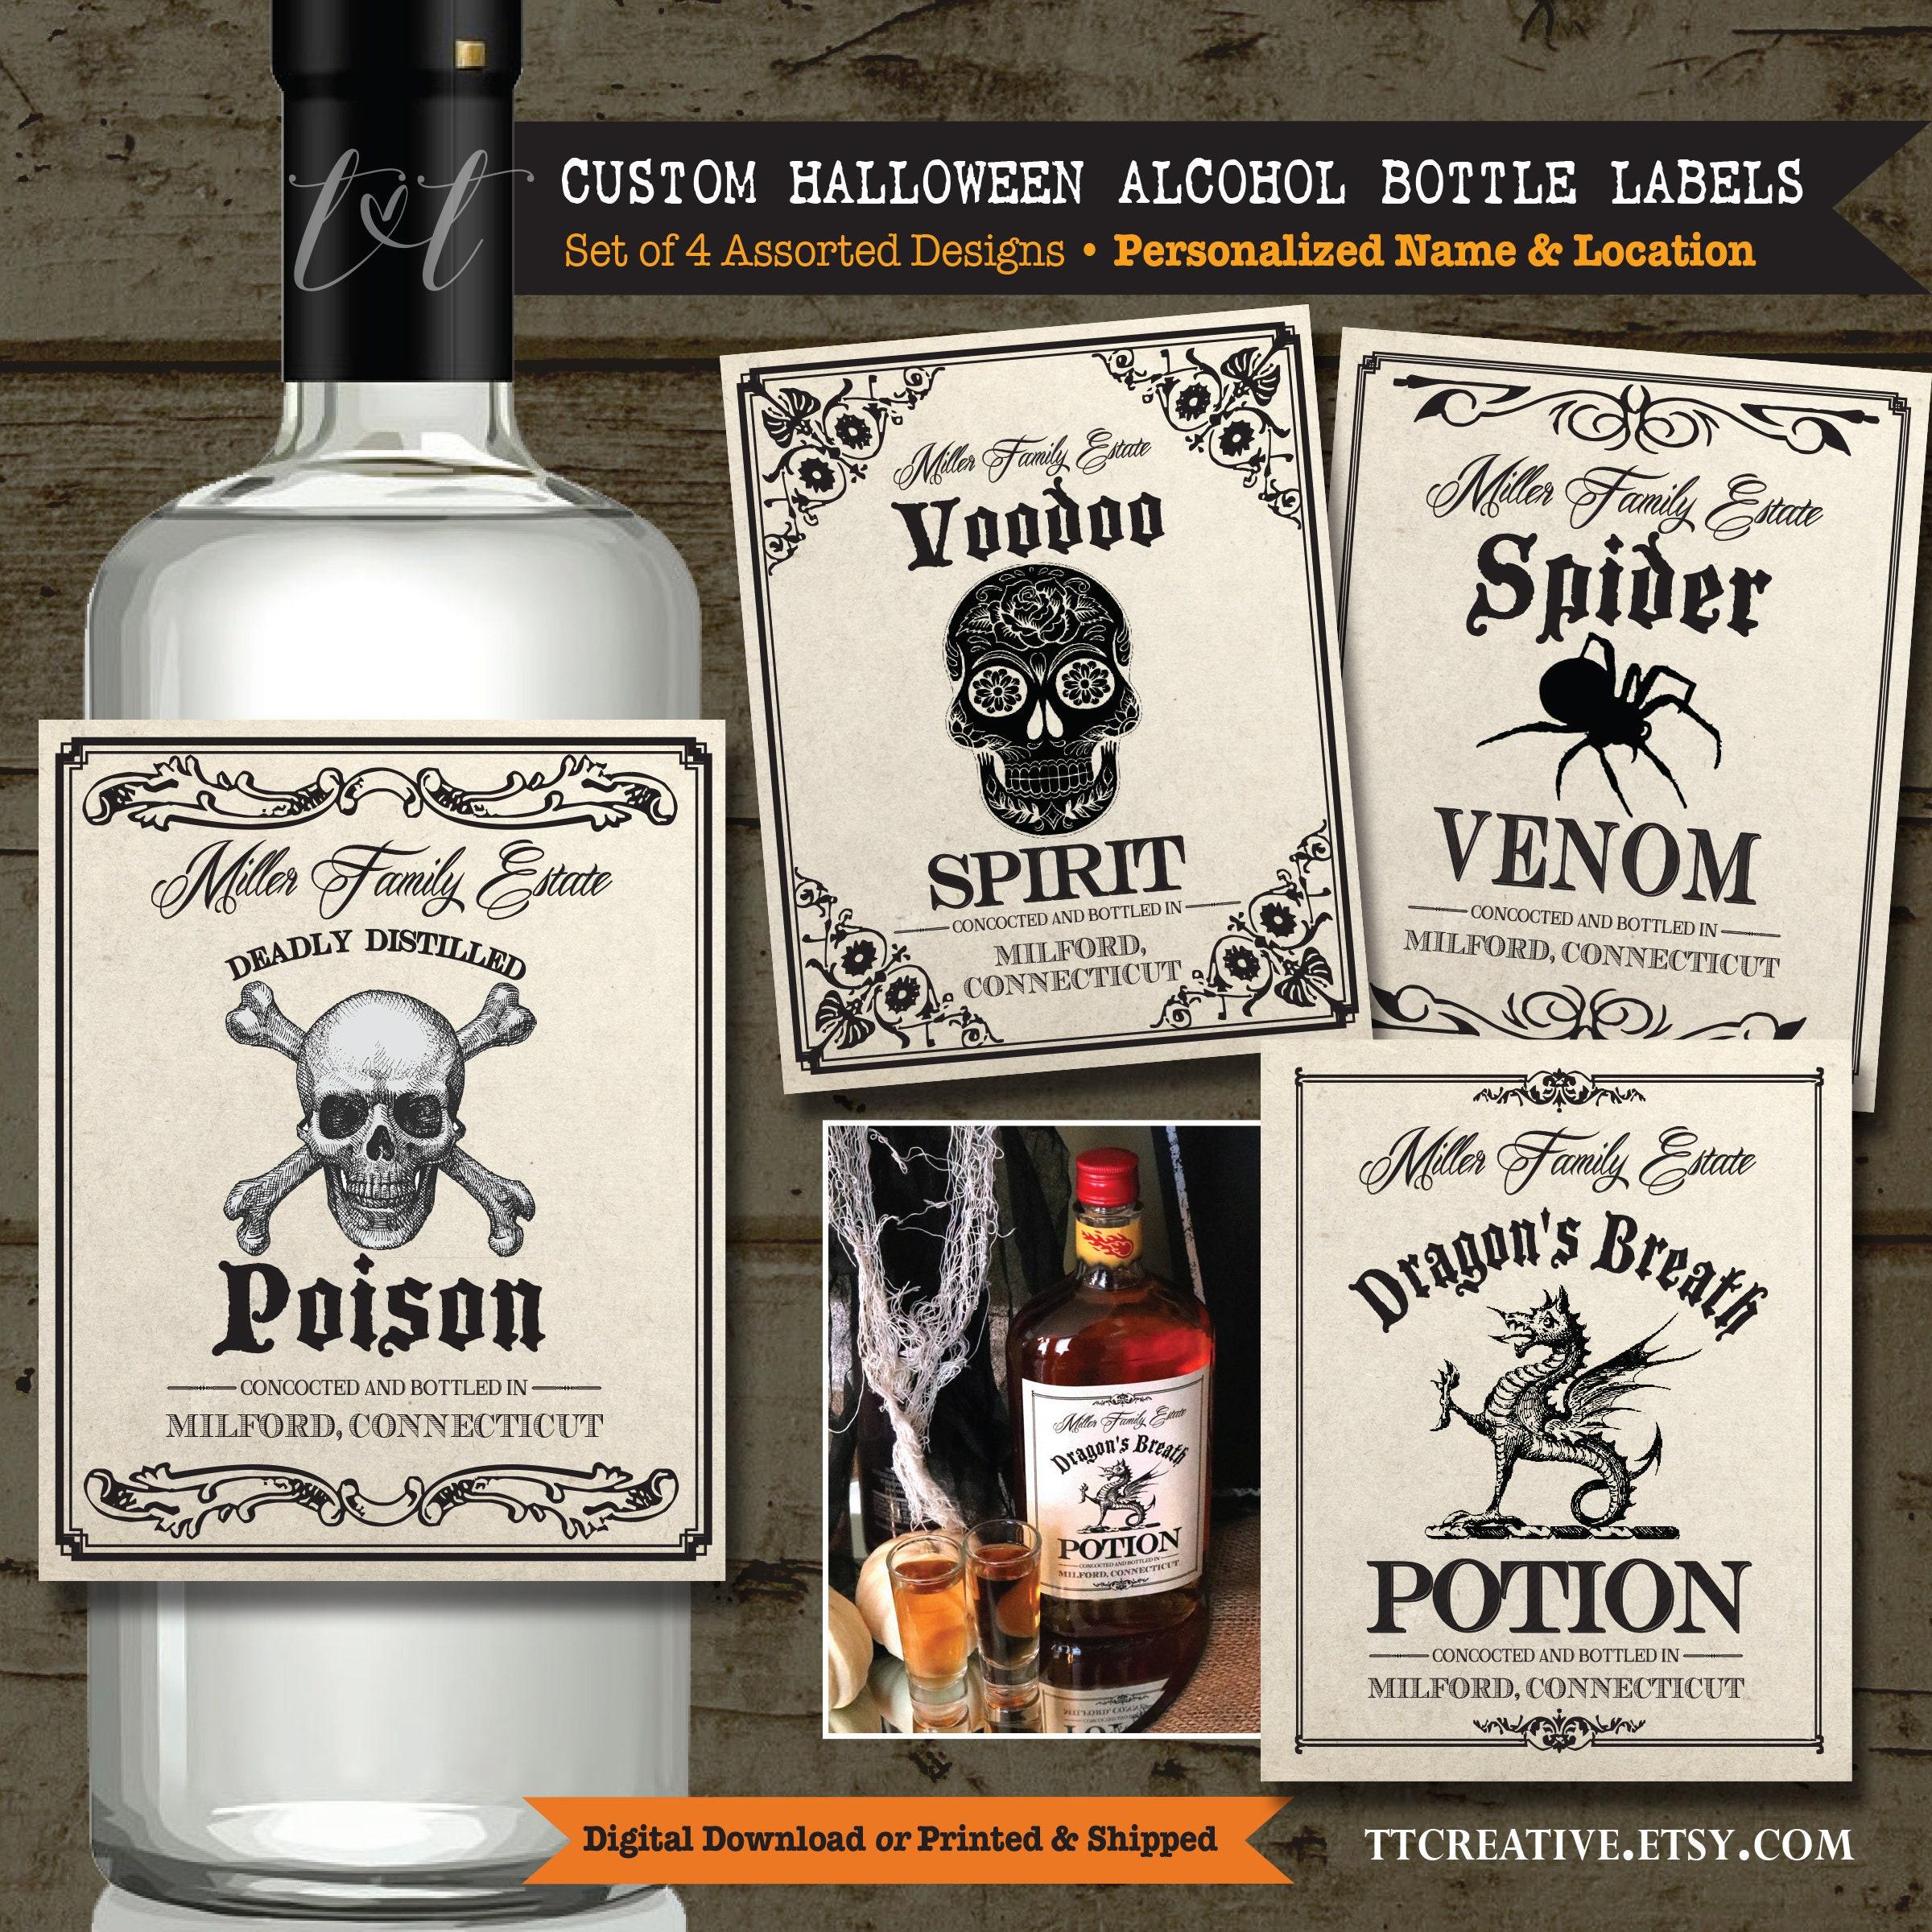 Vintage PERSONALIZED HALLOWEEN Liquor Bottle LABELS Custom